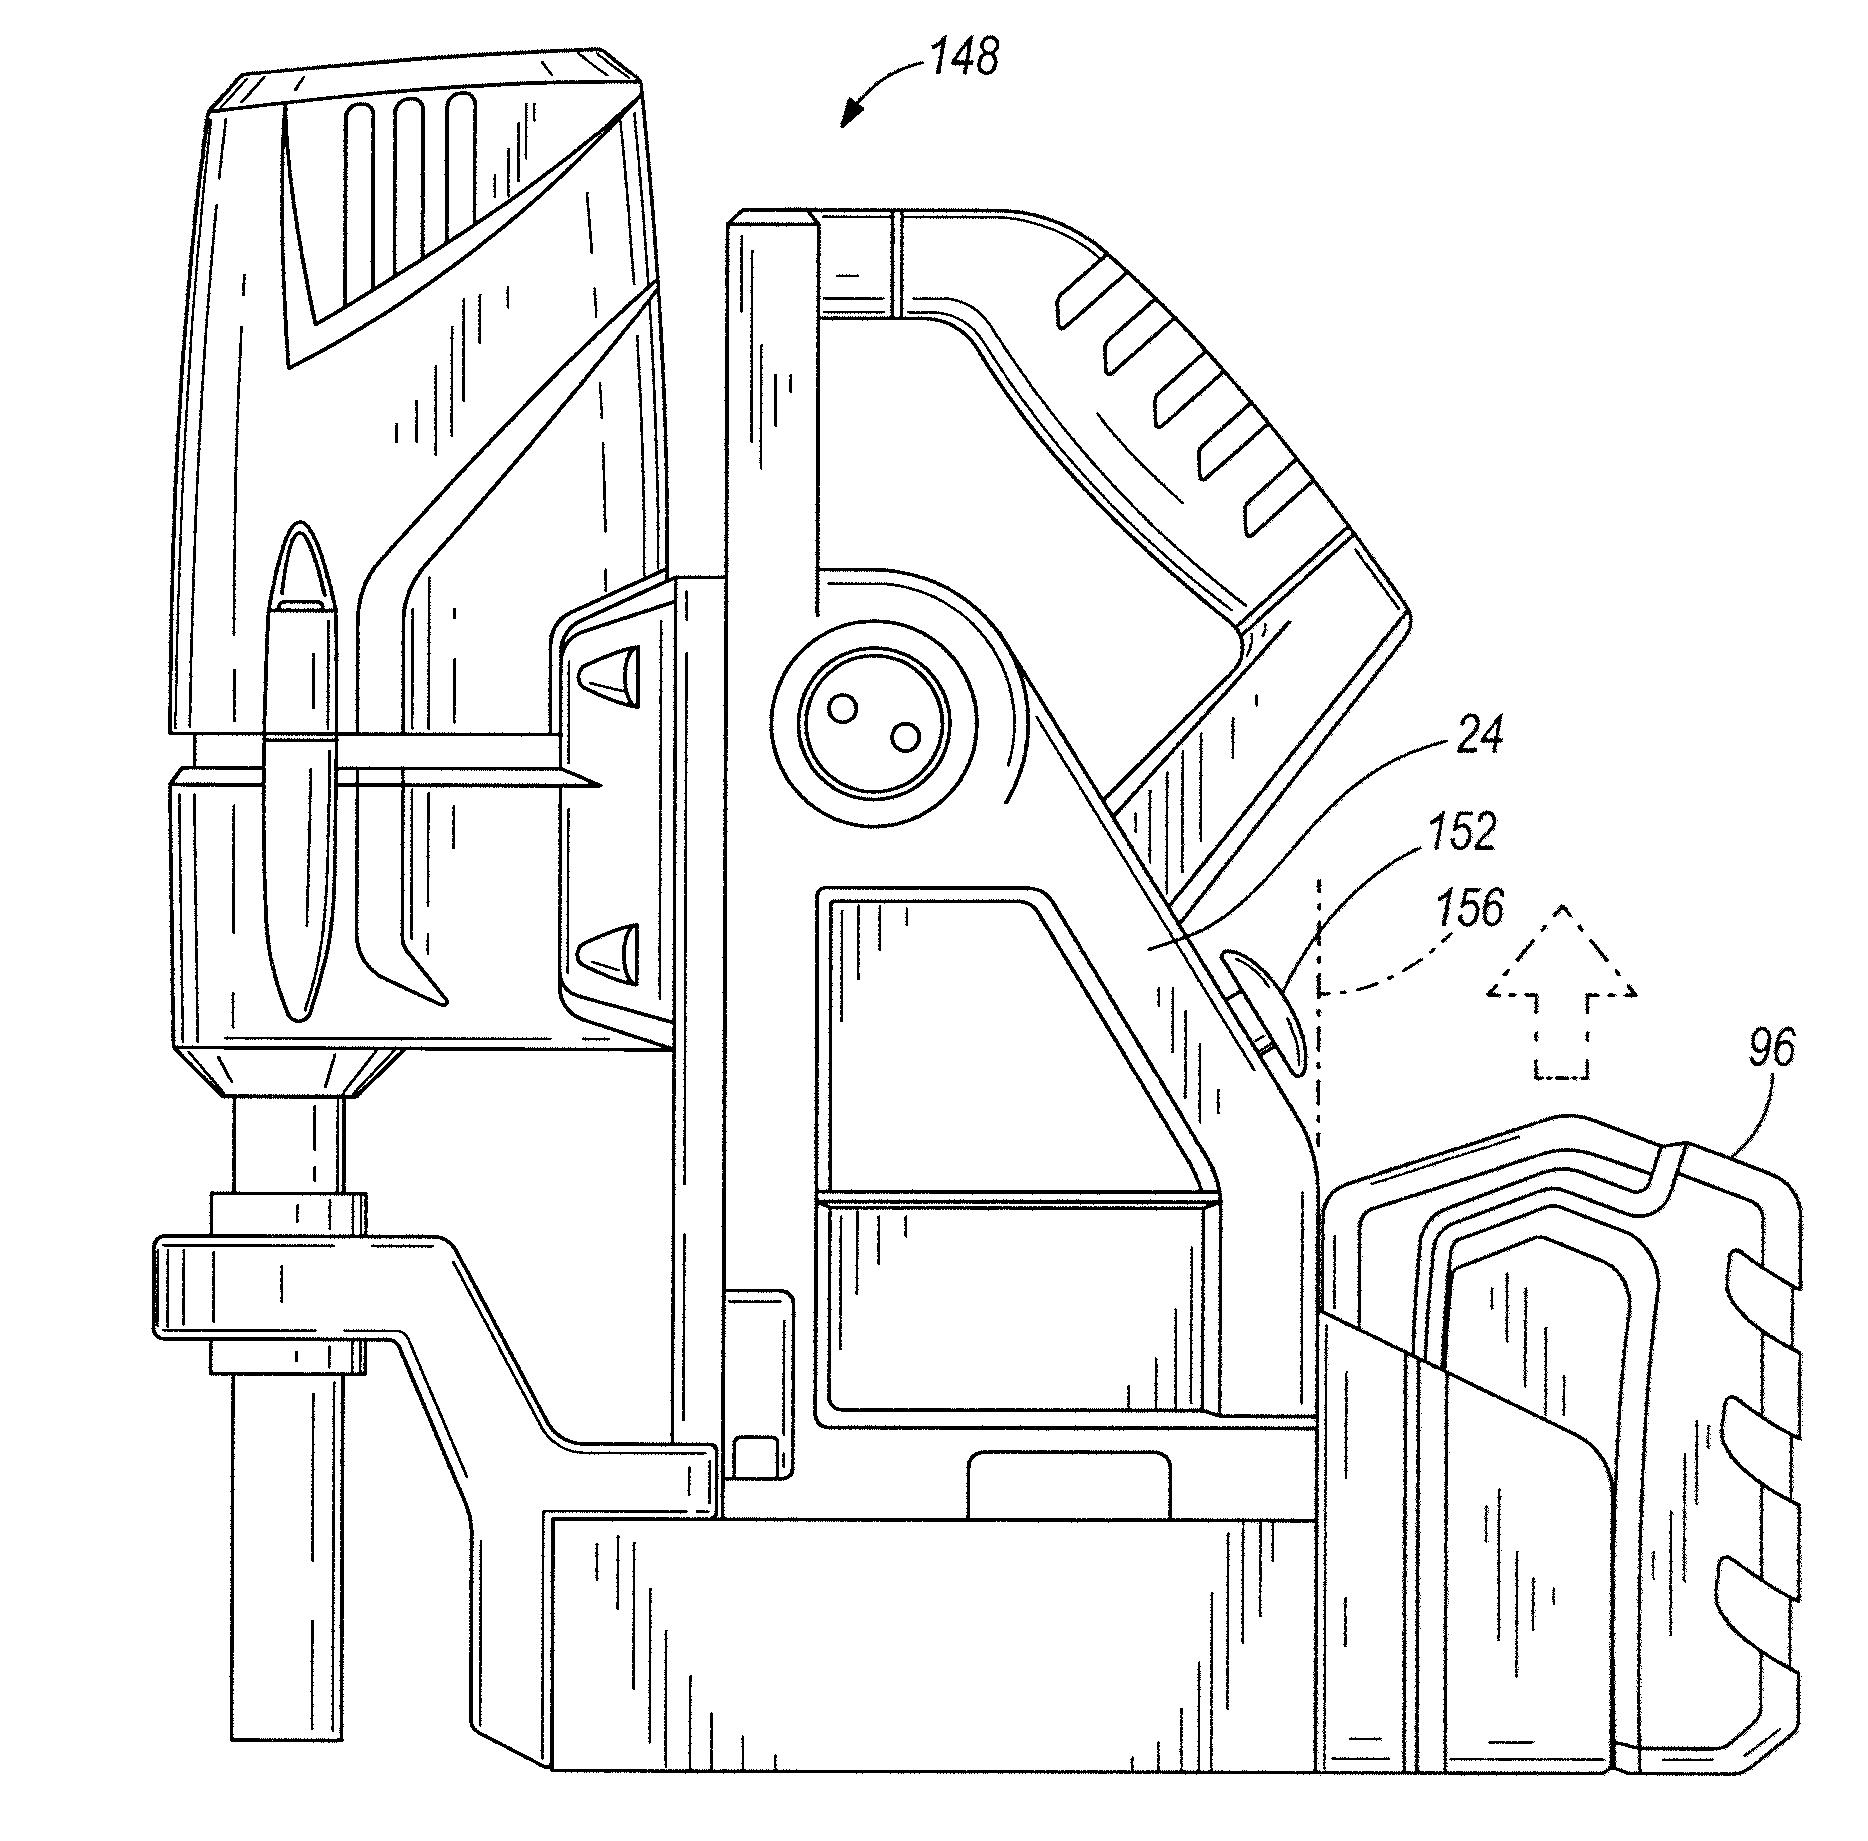 mag drill wiring diagram john deere gt262 engine diagram